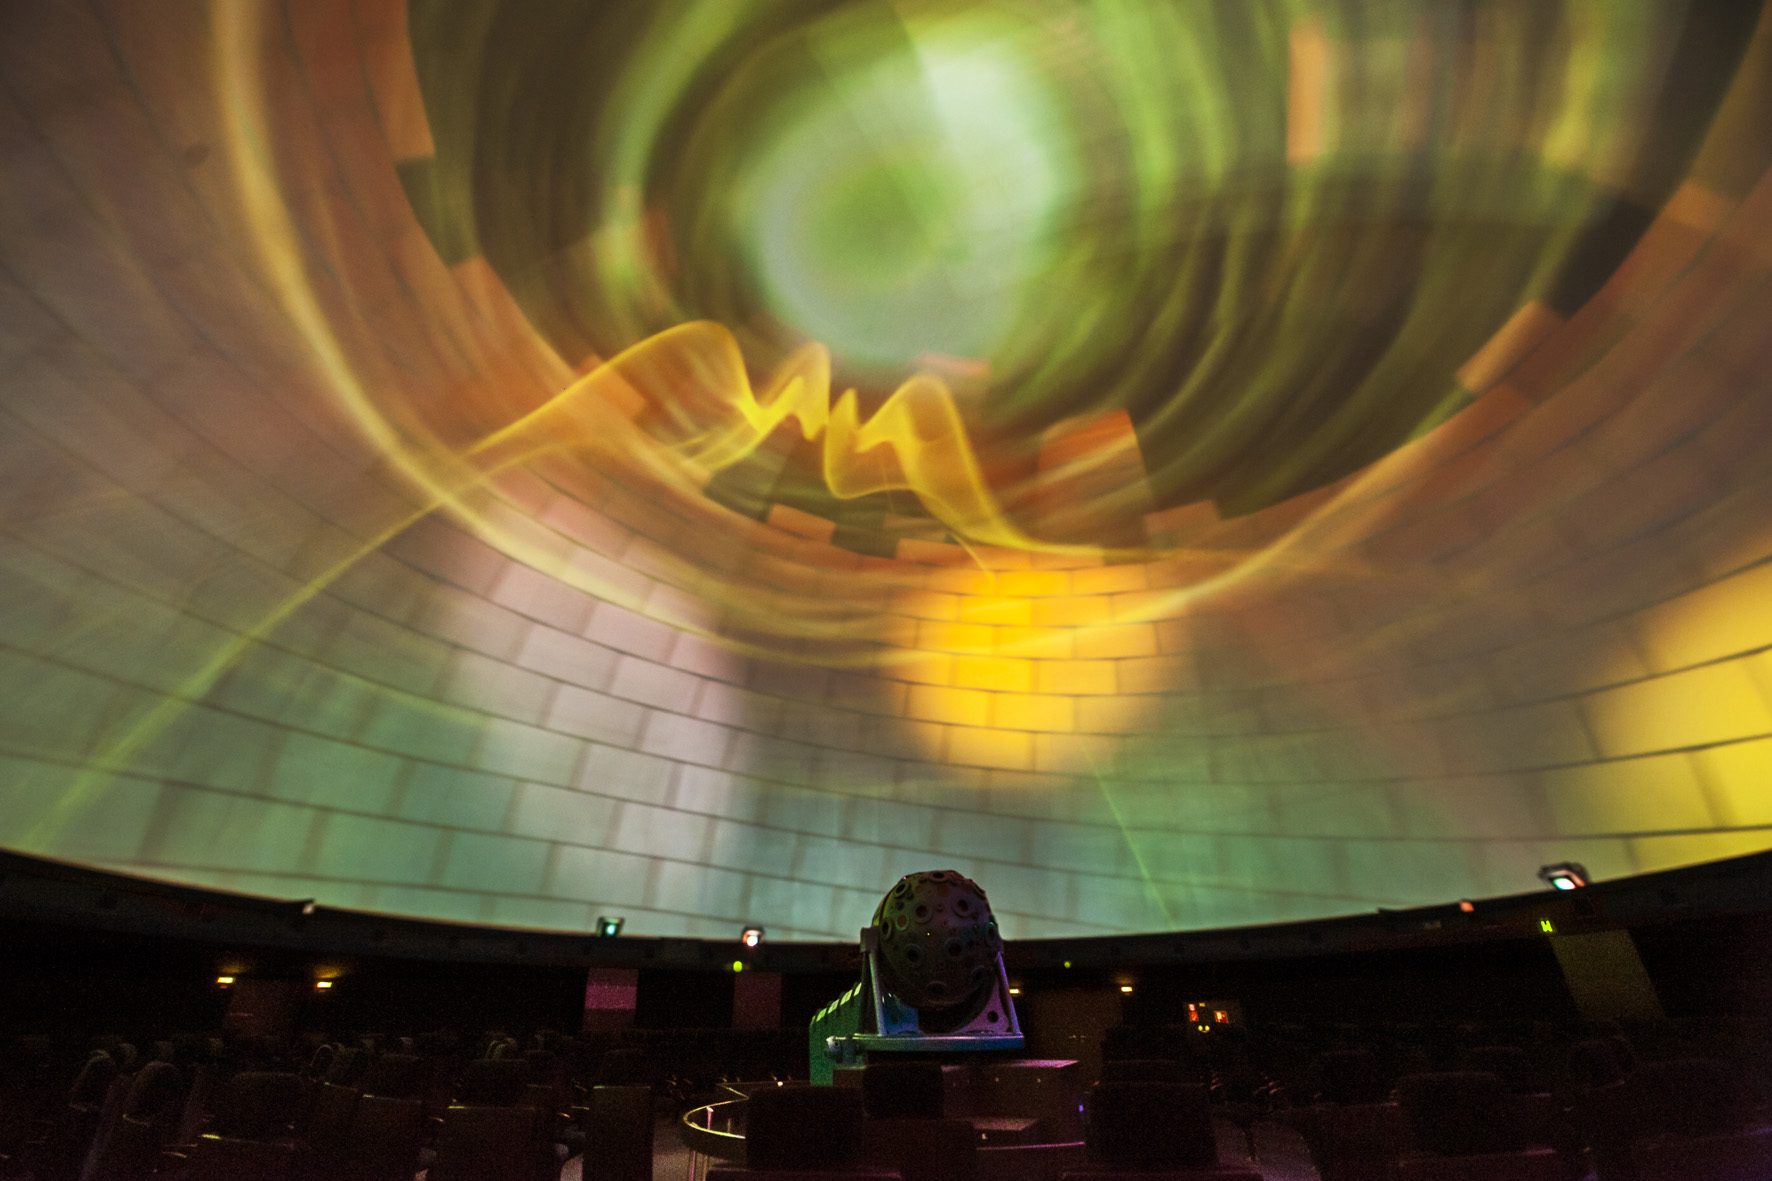 The Wall_Pink_Floyd(C)Oblonczyk,LWL.jpg